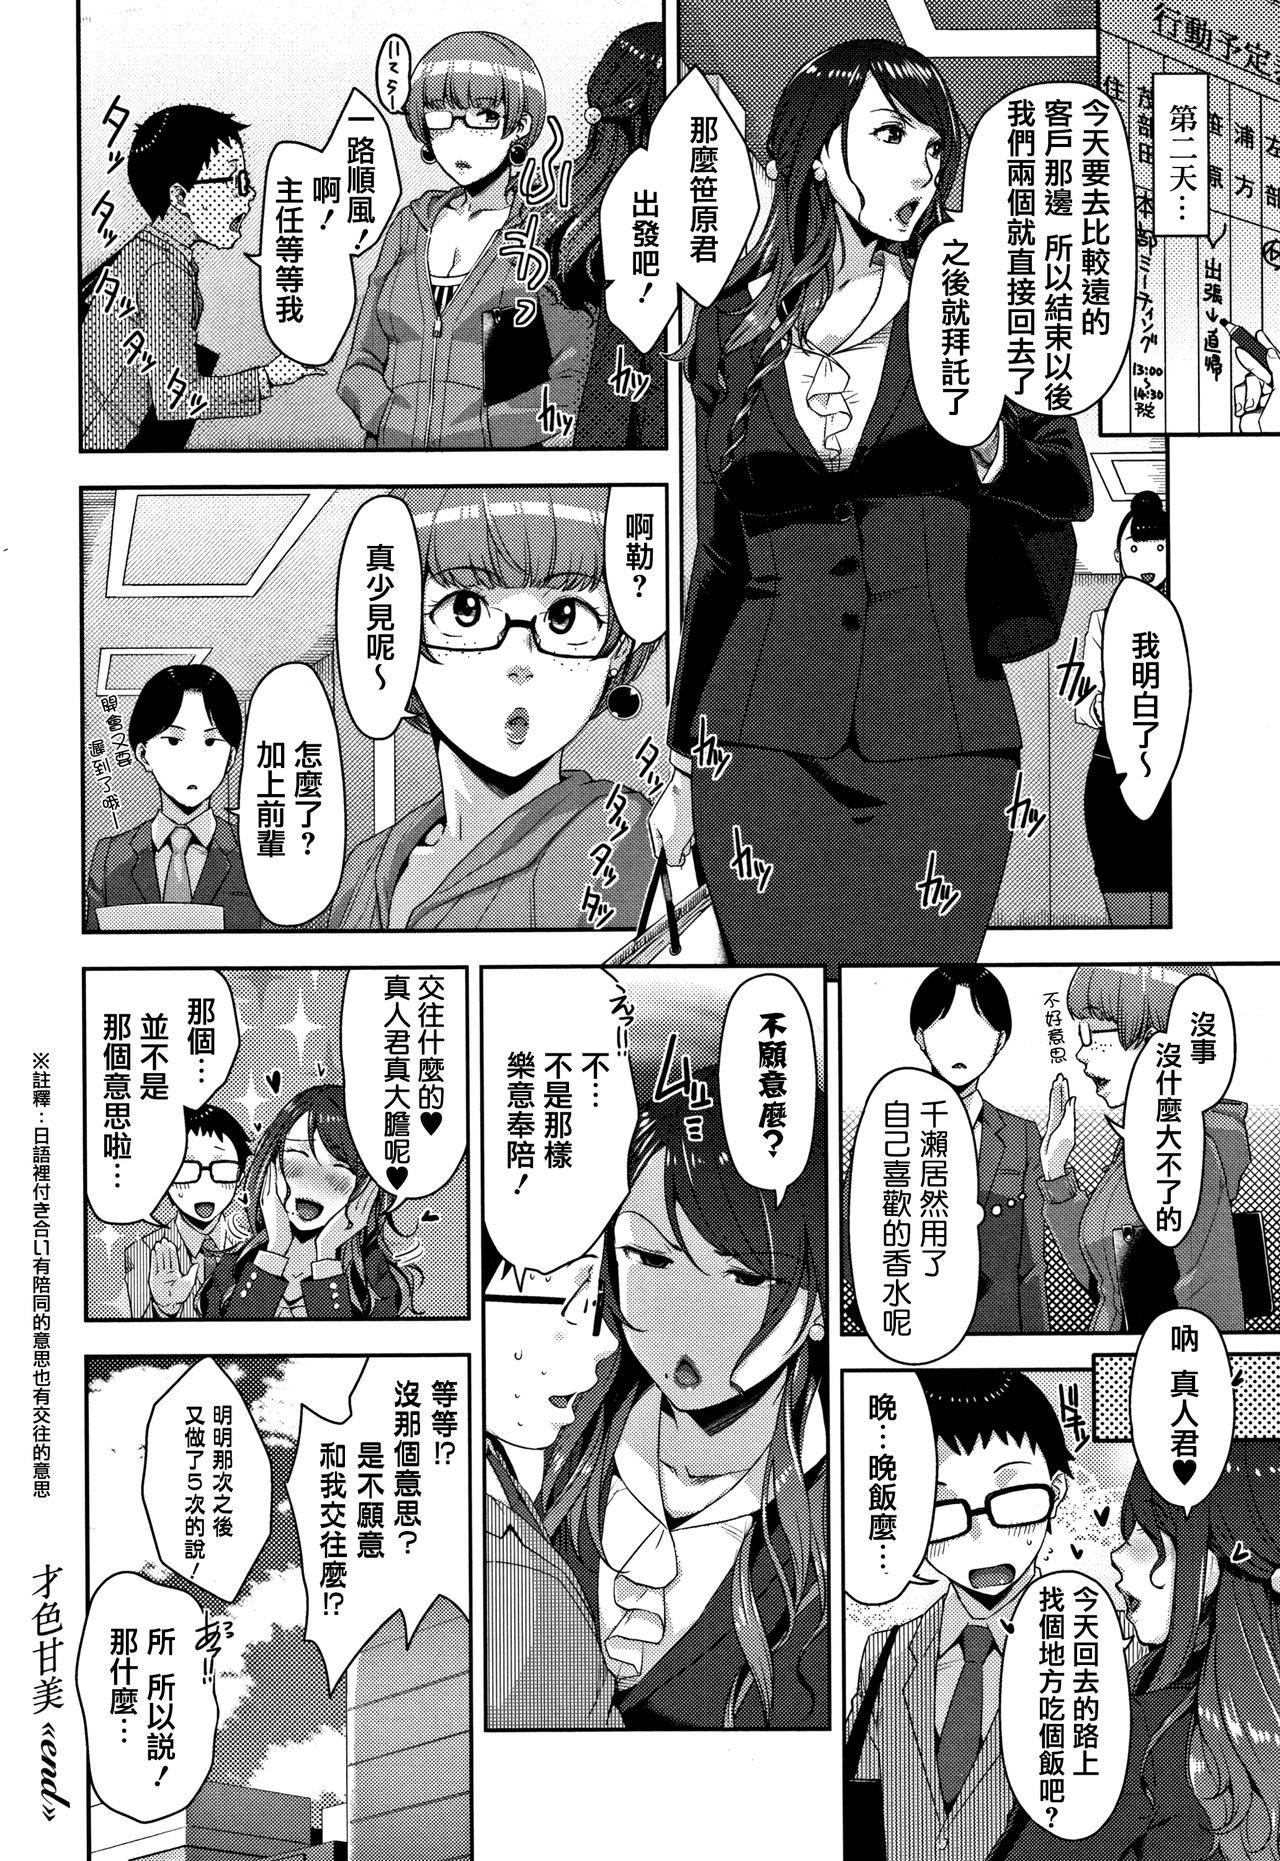 Kanjyuku Chijyo 111